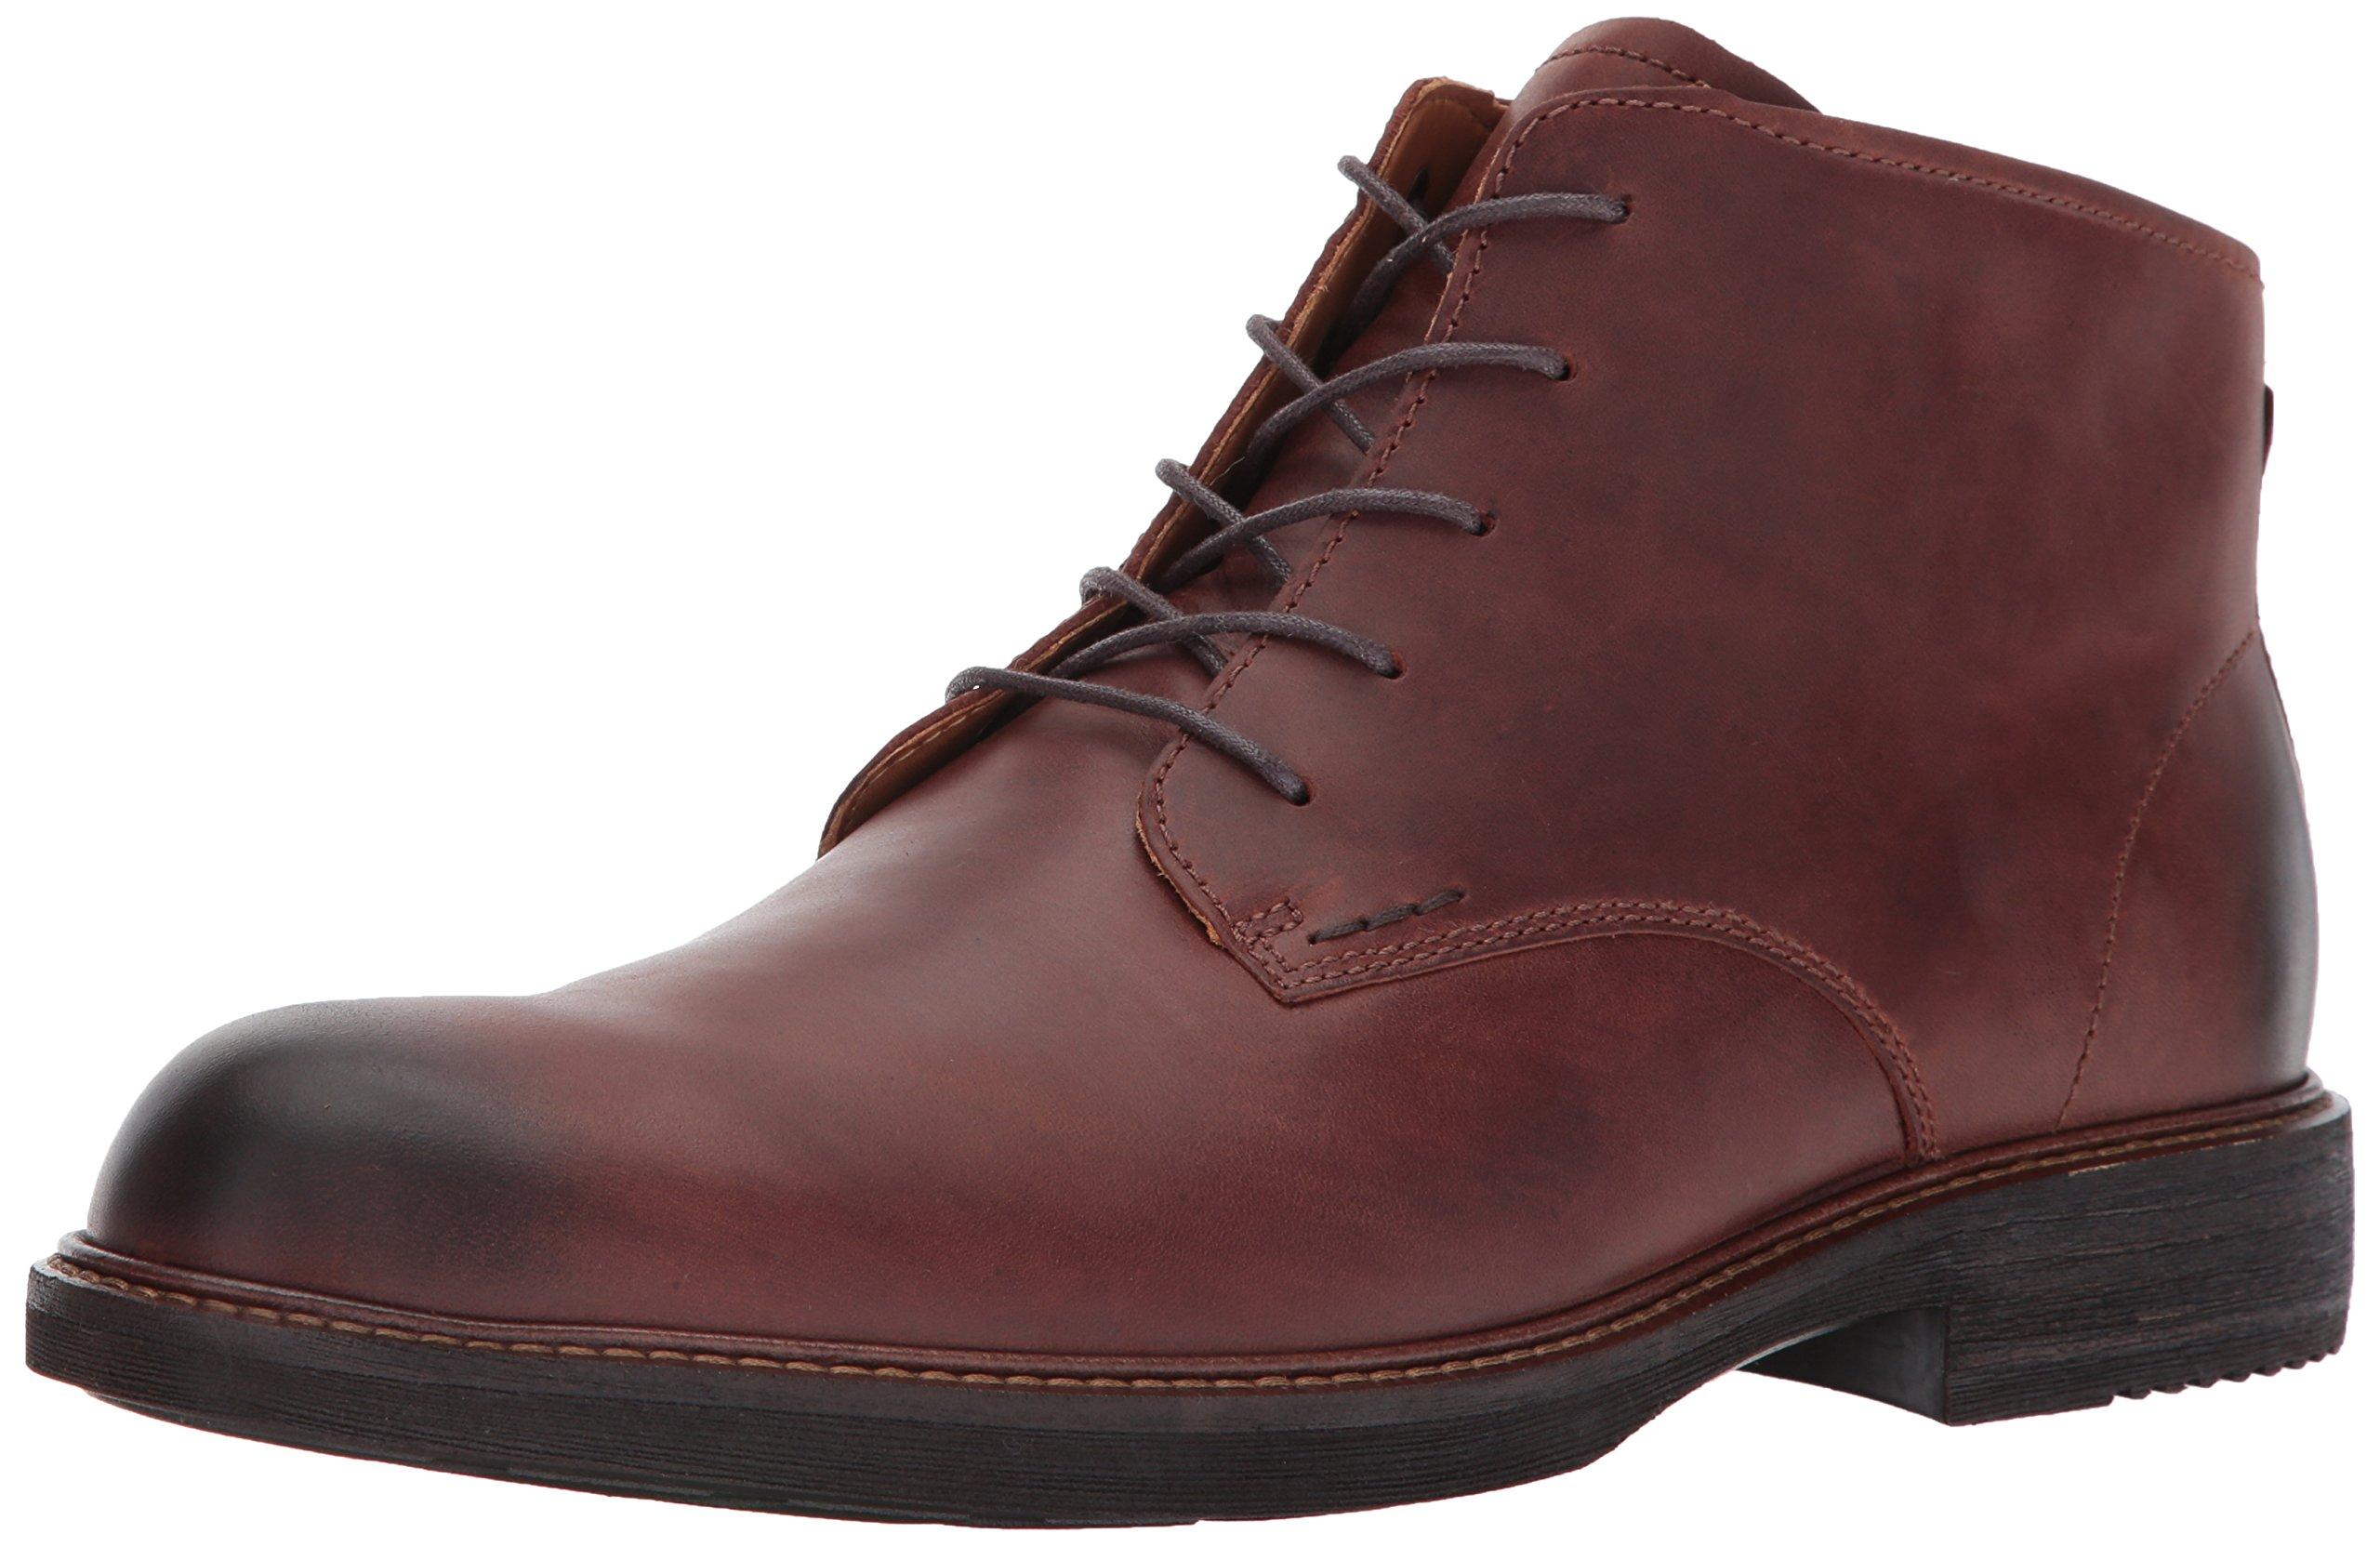 ECCO Men's Kenton Plain Toe Chukka Boot, Mink, 45 EU/11-11.5 M US by ECCO